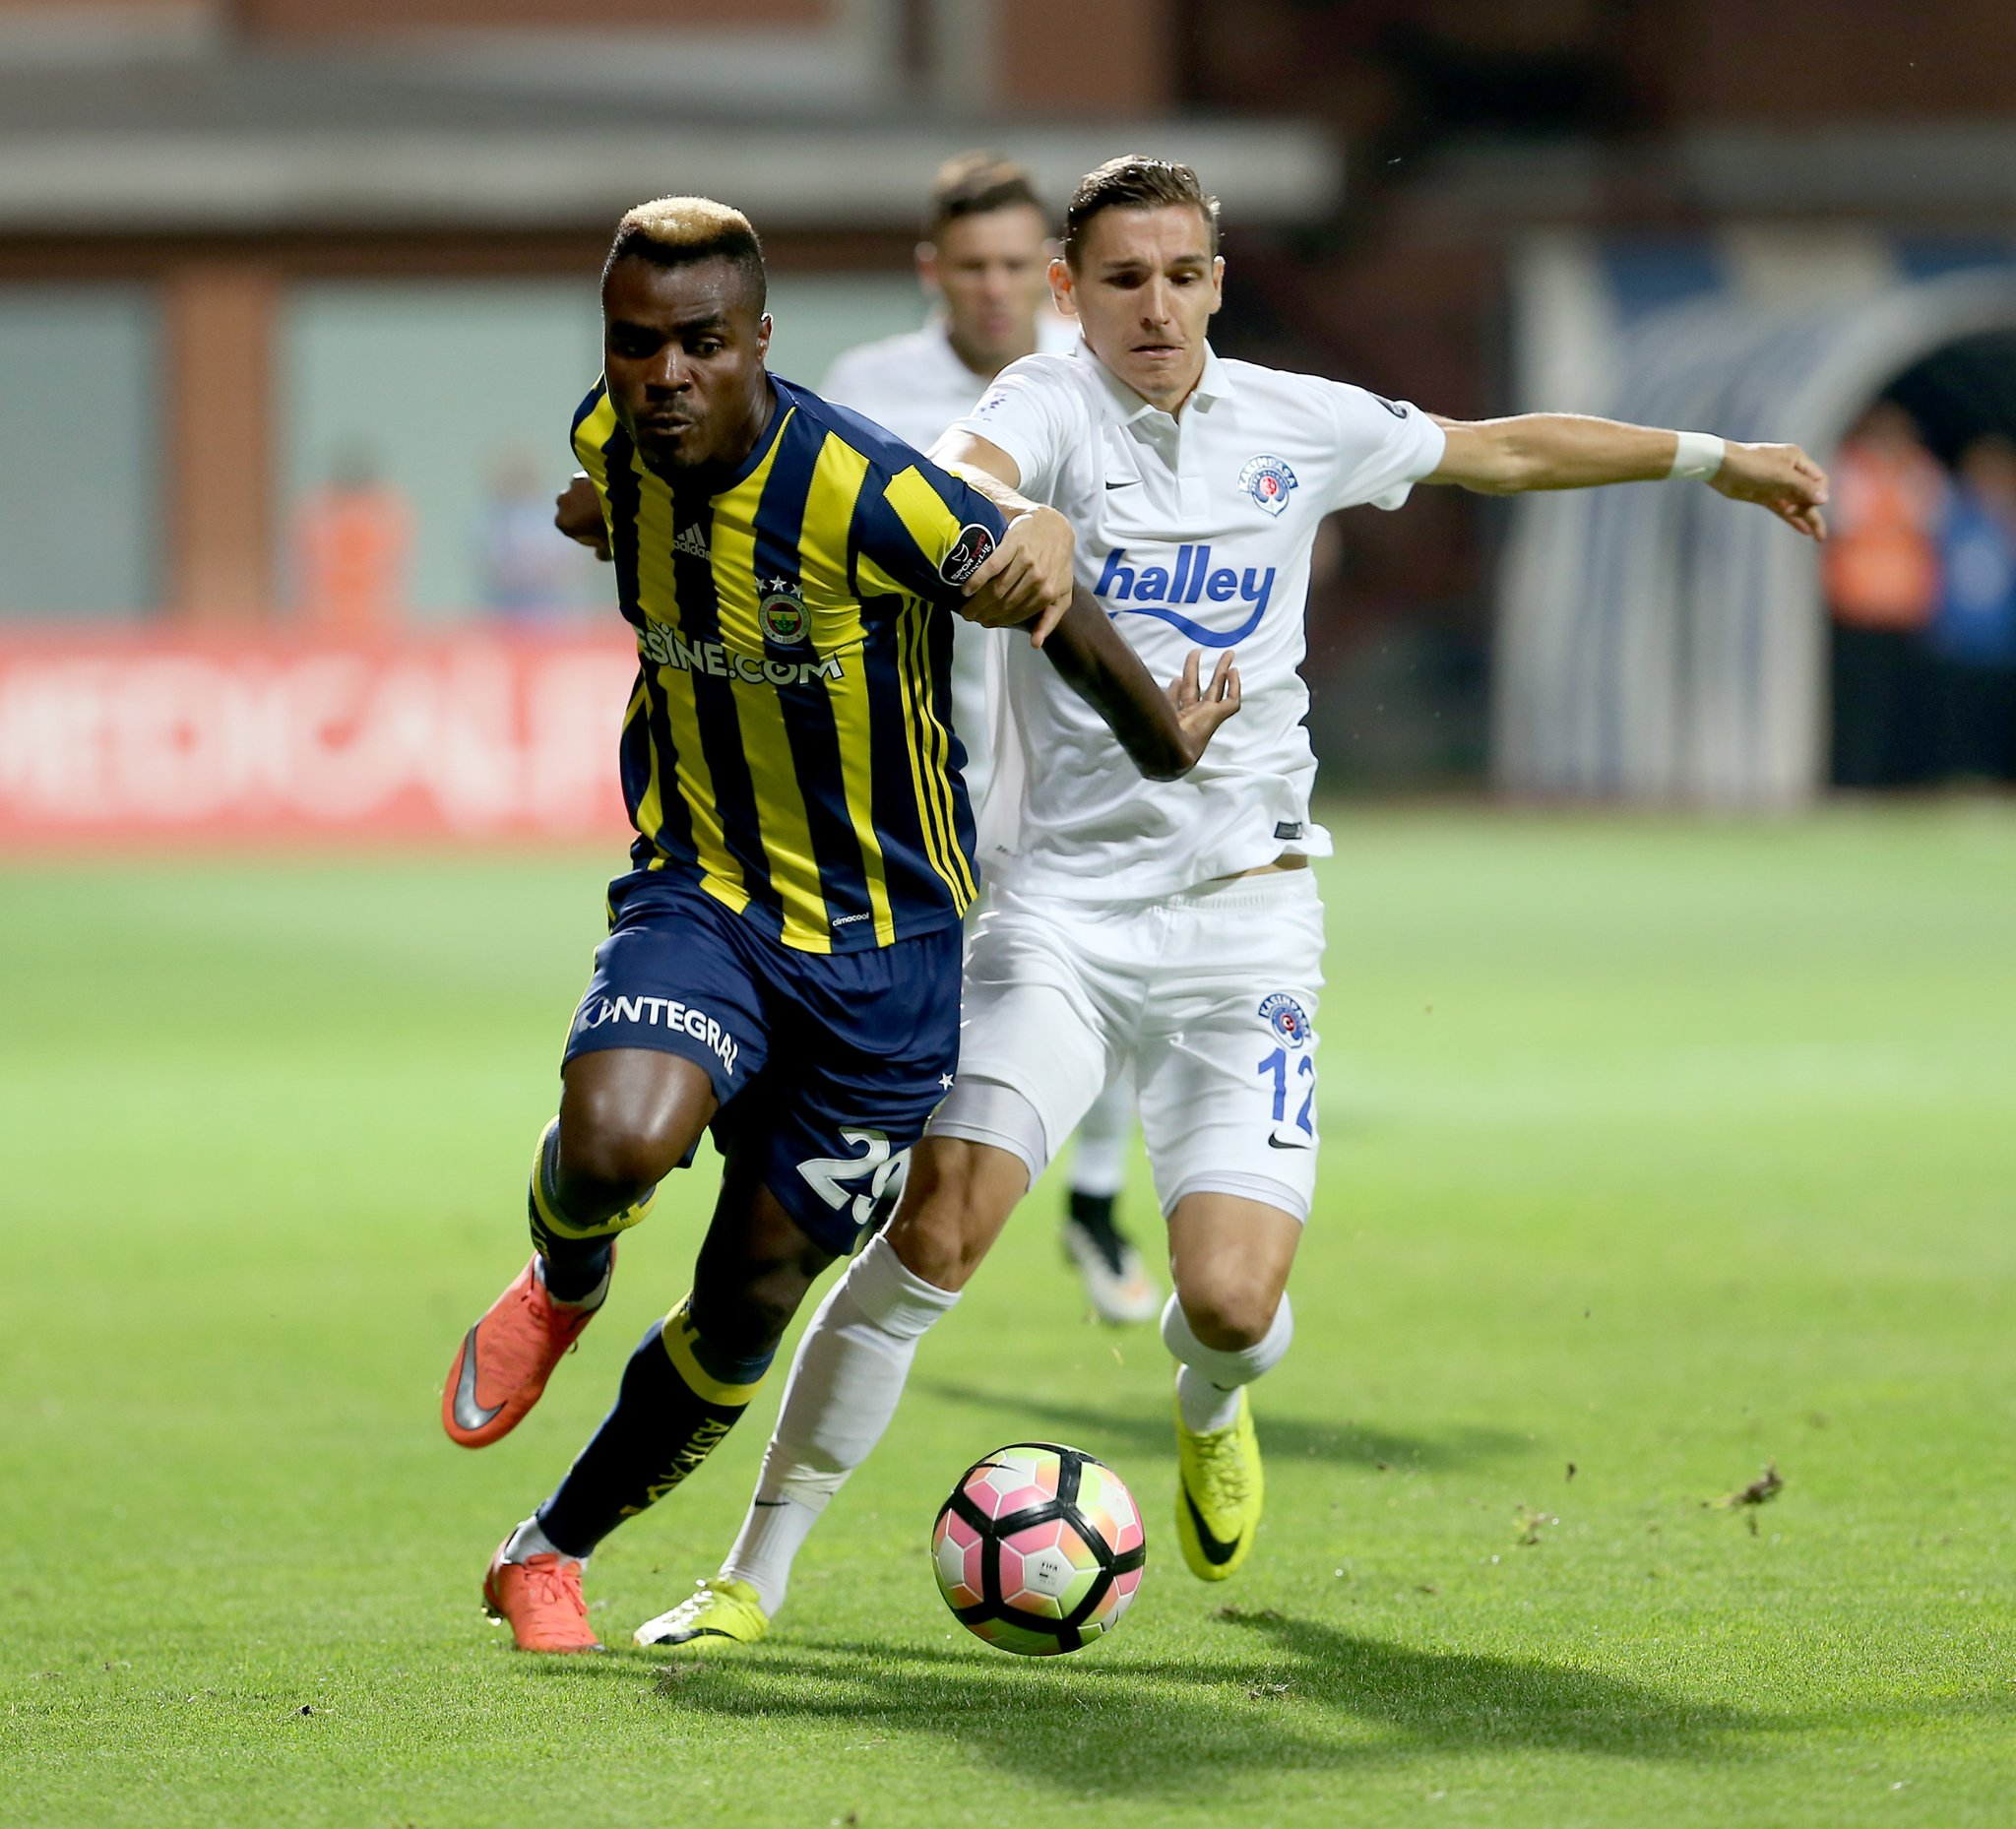 Europa: Emenike Subbed Off In Fenerbahce Win, Igiebor Loses With Maccabi